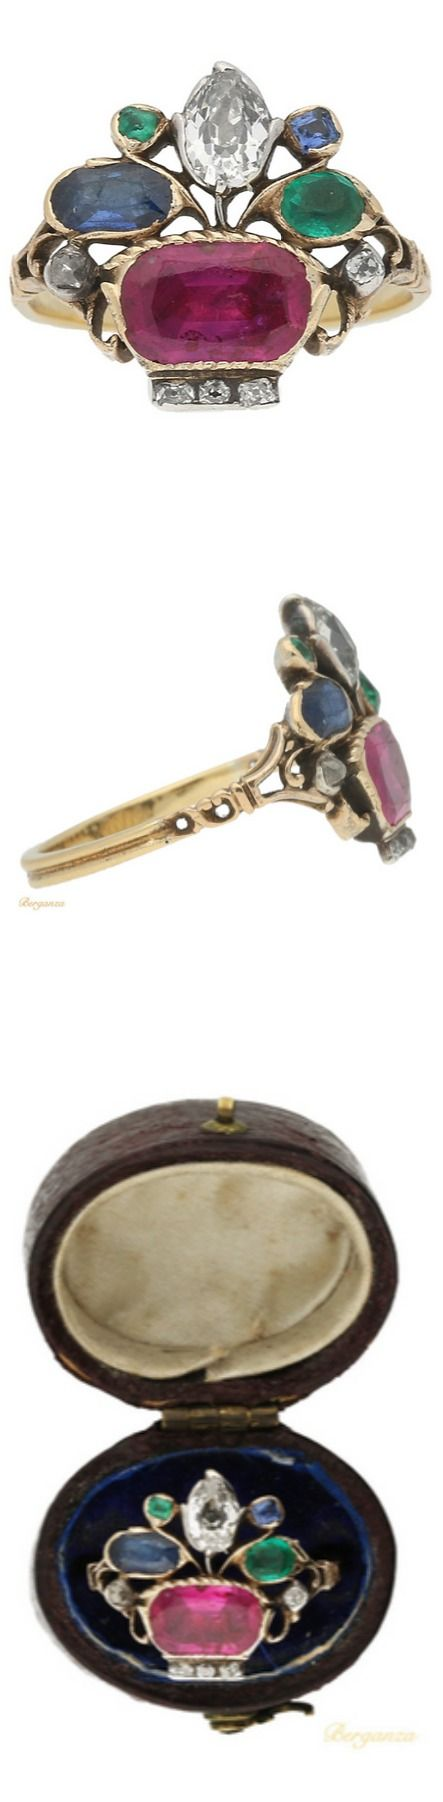 Very Rare Georgian Ruby Sapphire Emerald Diamond Gold Ring Circa 1760 Giardinetti Means Little Gardens Ancient Jewelry Antique Jewelry Historical Jewellery